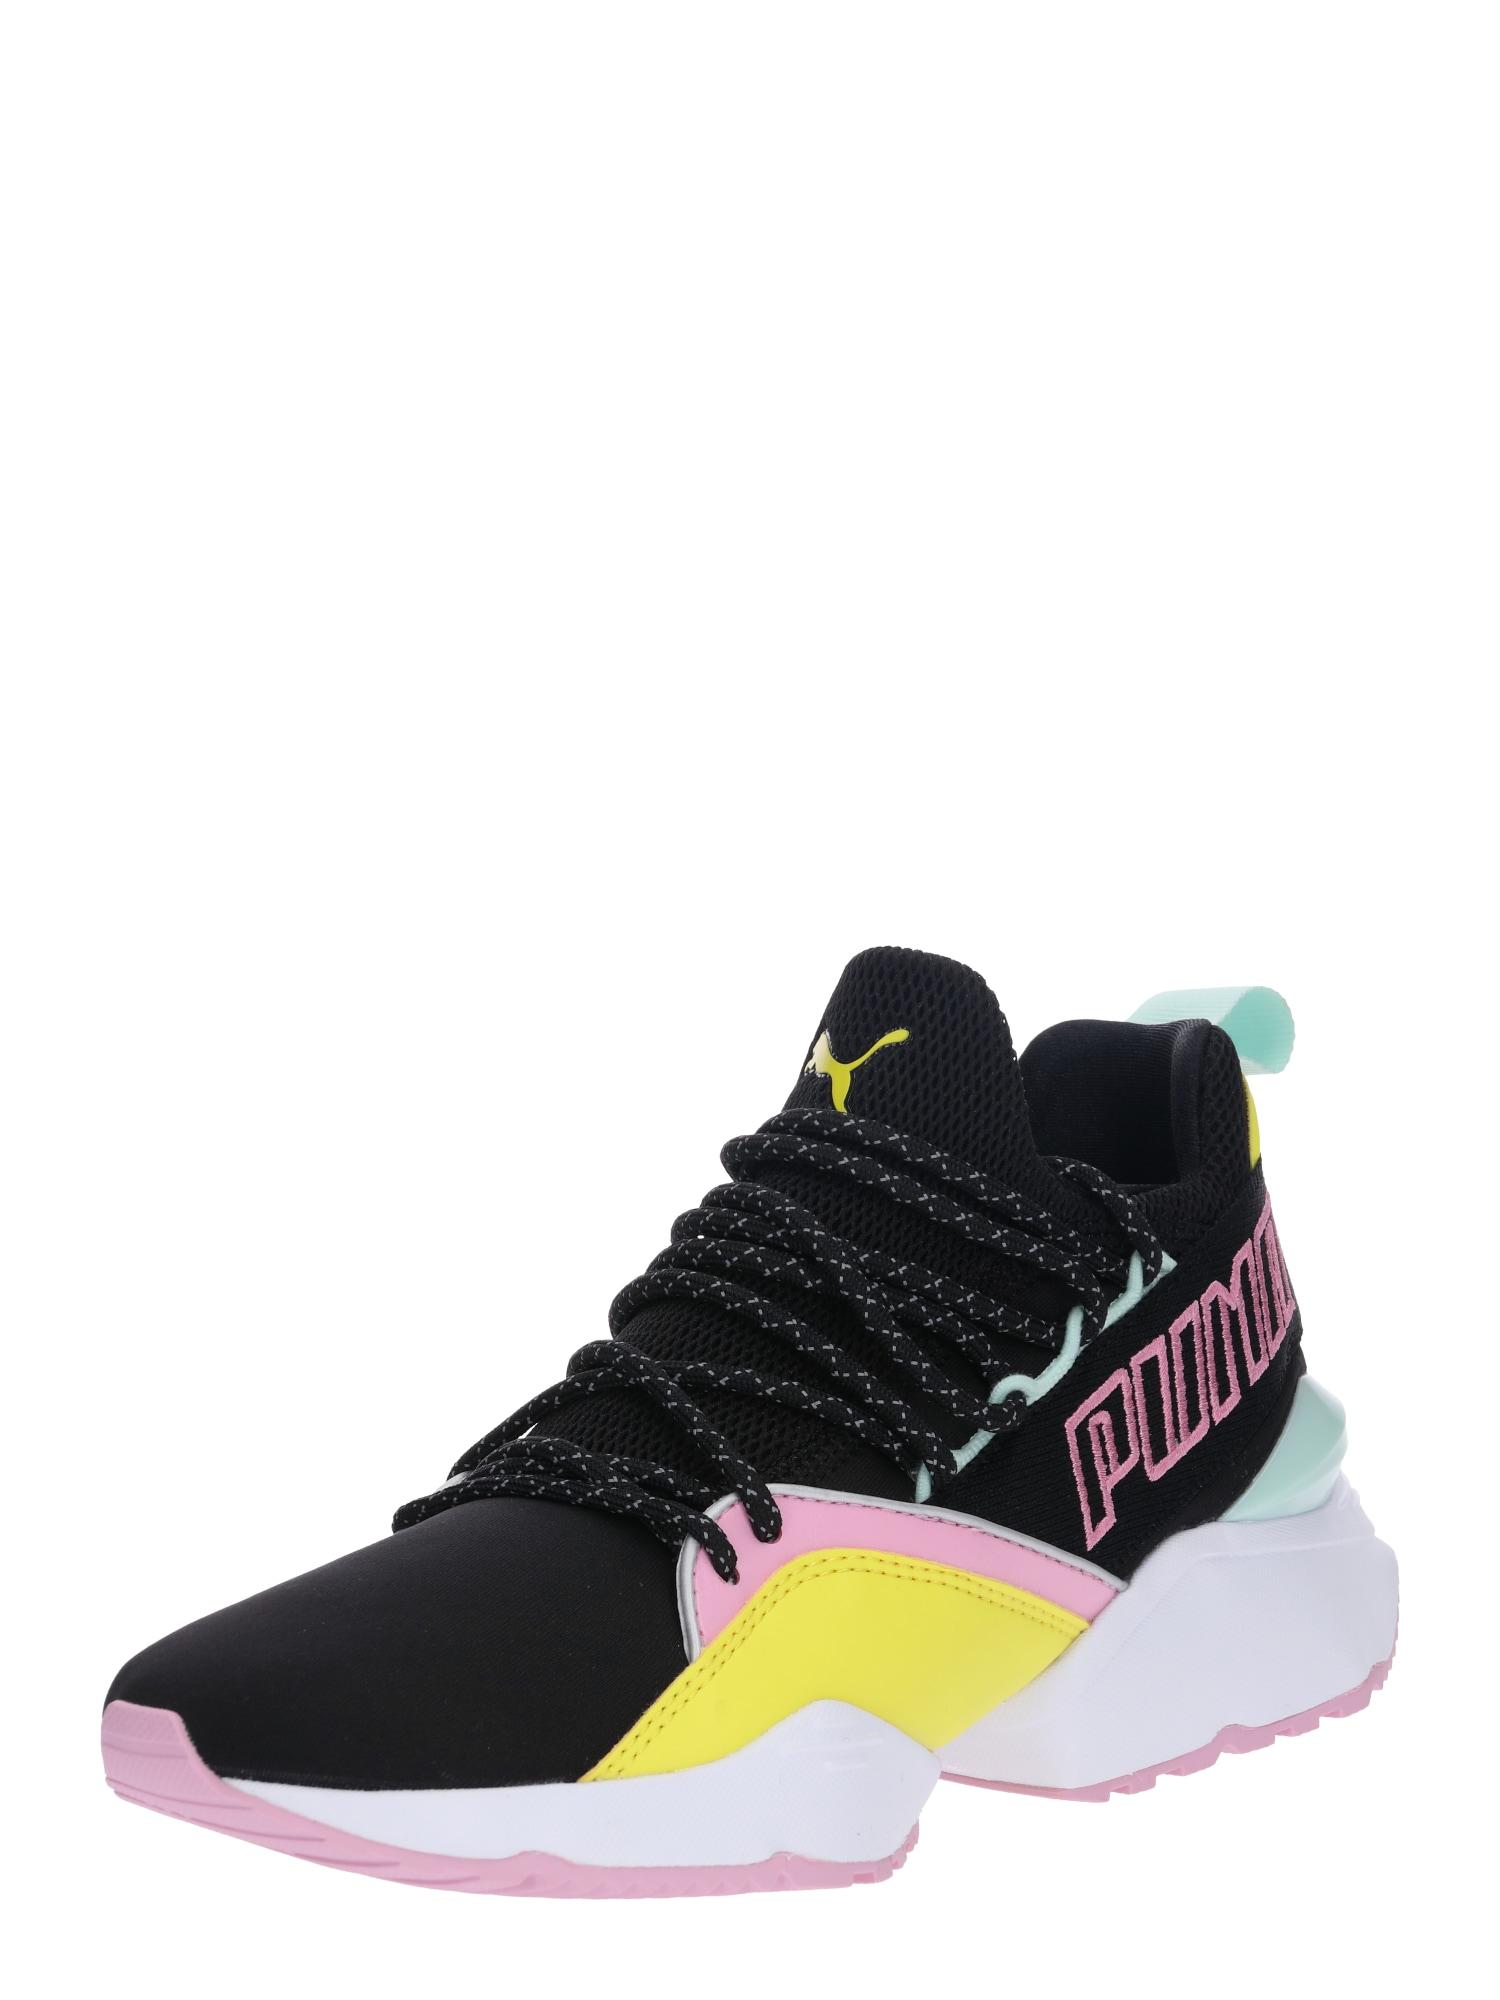 PUMA, Dames Sneakers laag 'Muse Maia', geel / mintgroen / lichtroze / zwart